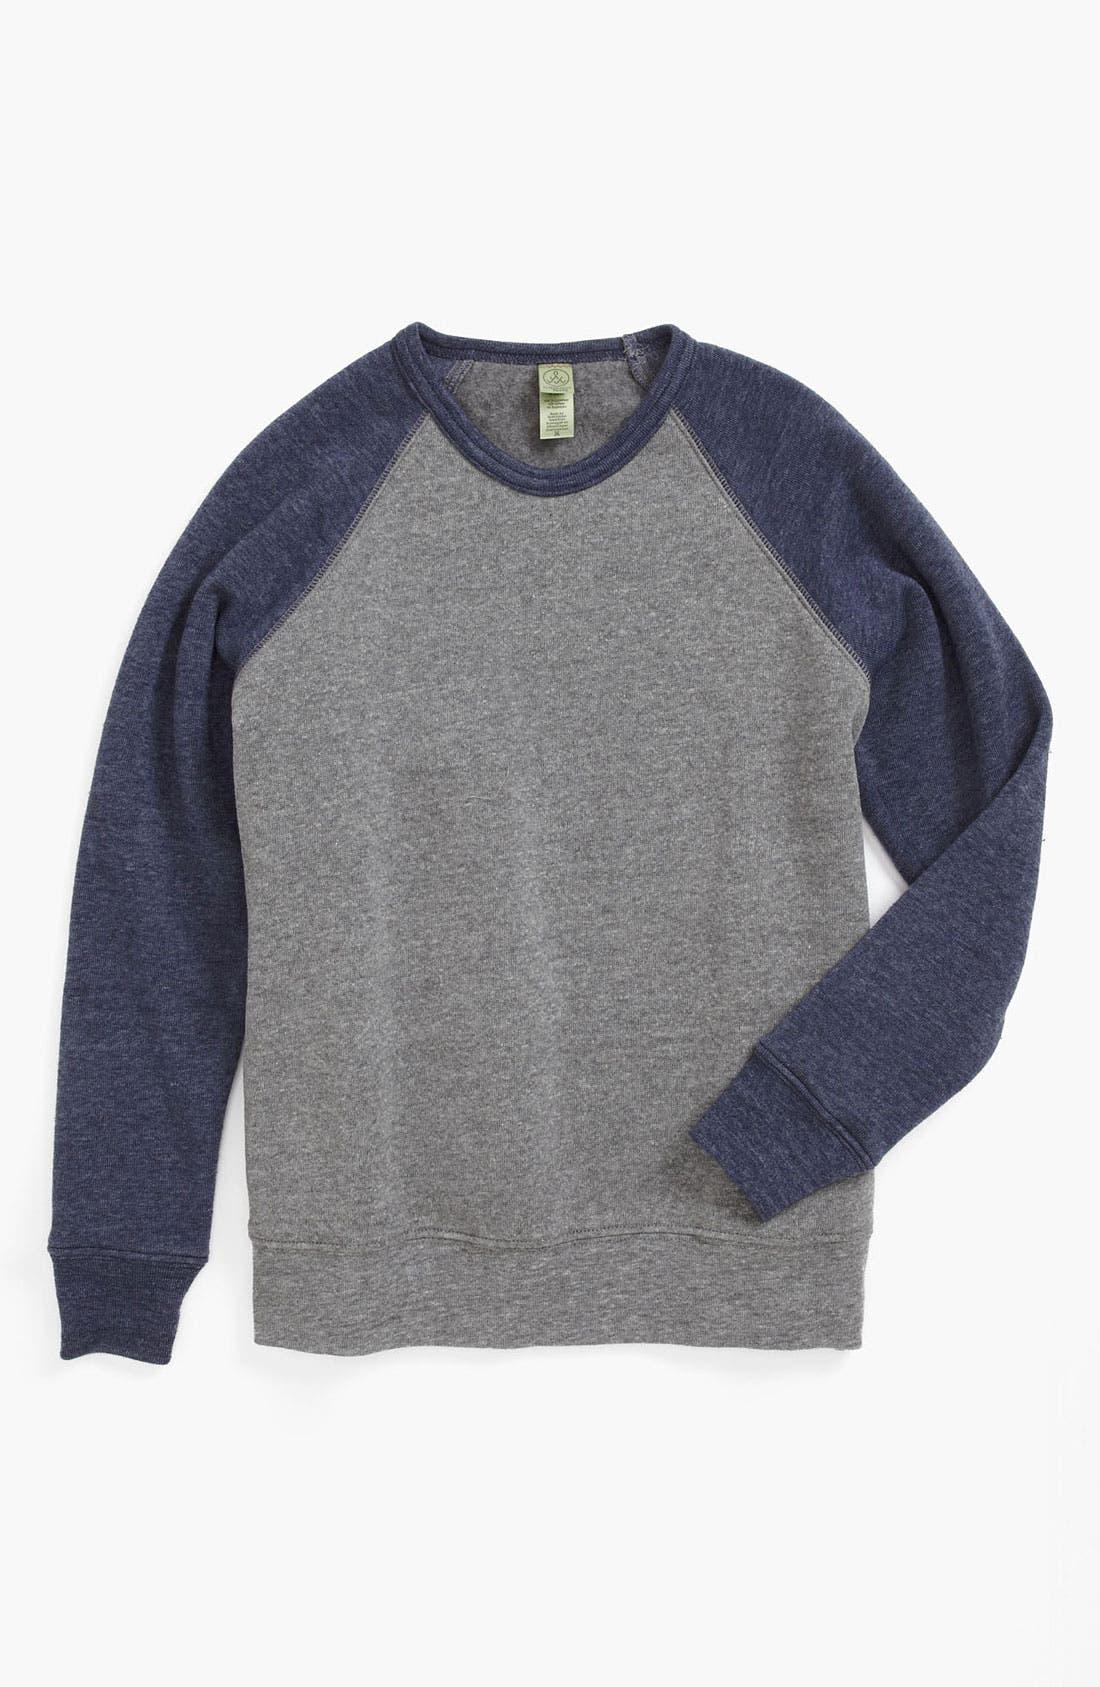 Main Image - Alternative Colorblock Sweatshirt (Big Boys)